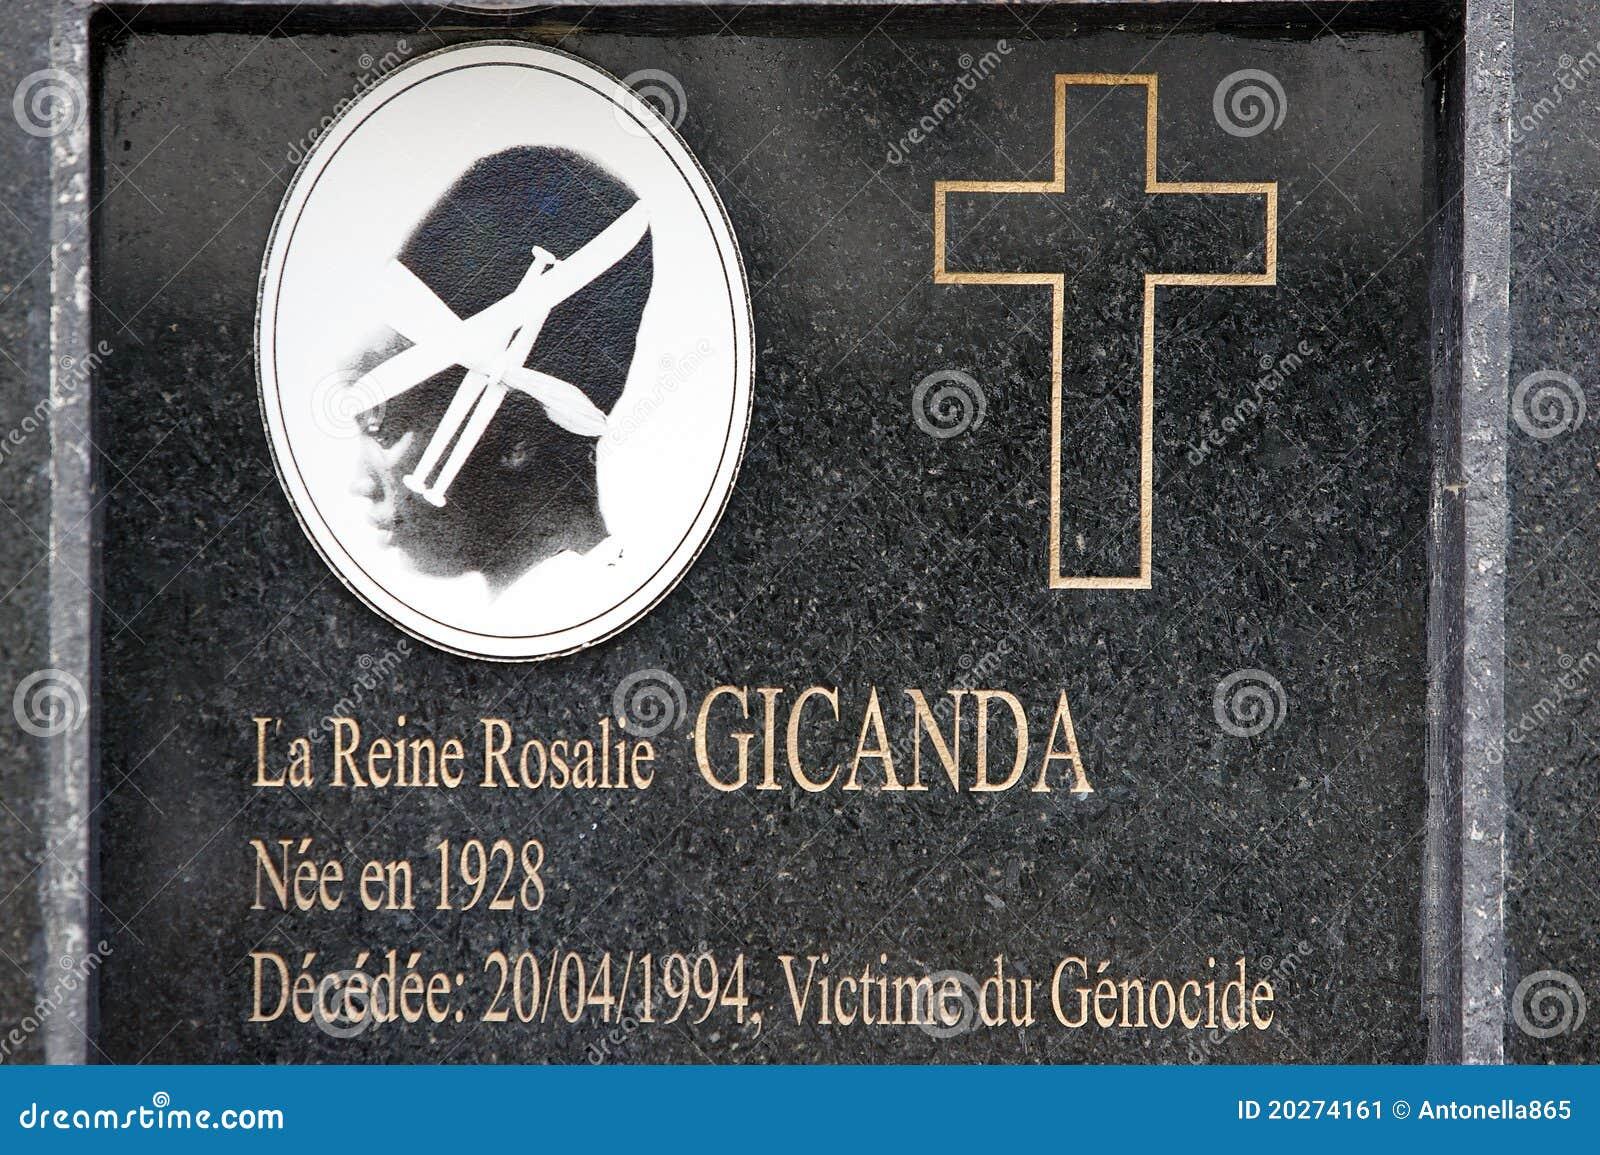 Queen Rosalie Gicanda grave